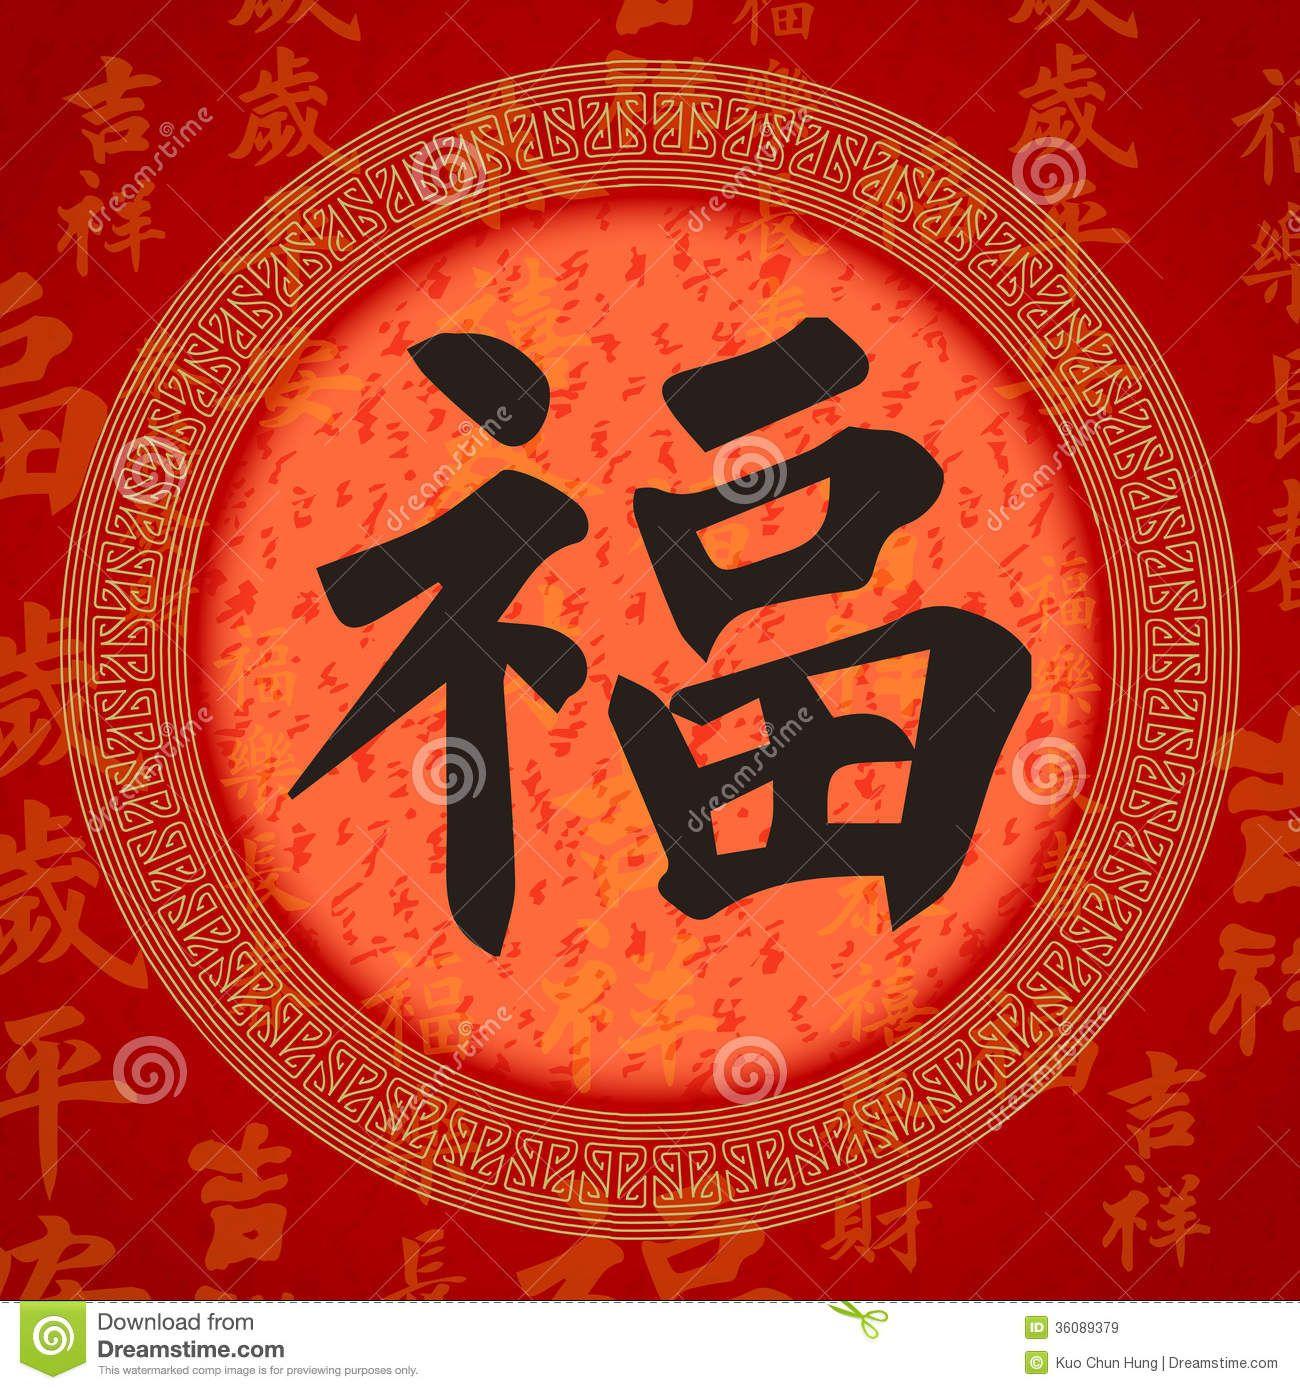 Calligraphy chinese good luck symbols download from over 26 calligraphy chinese good luck symbols download from over 26 million high quality stock photos buycottarizona